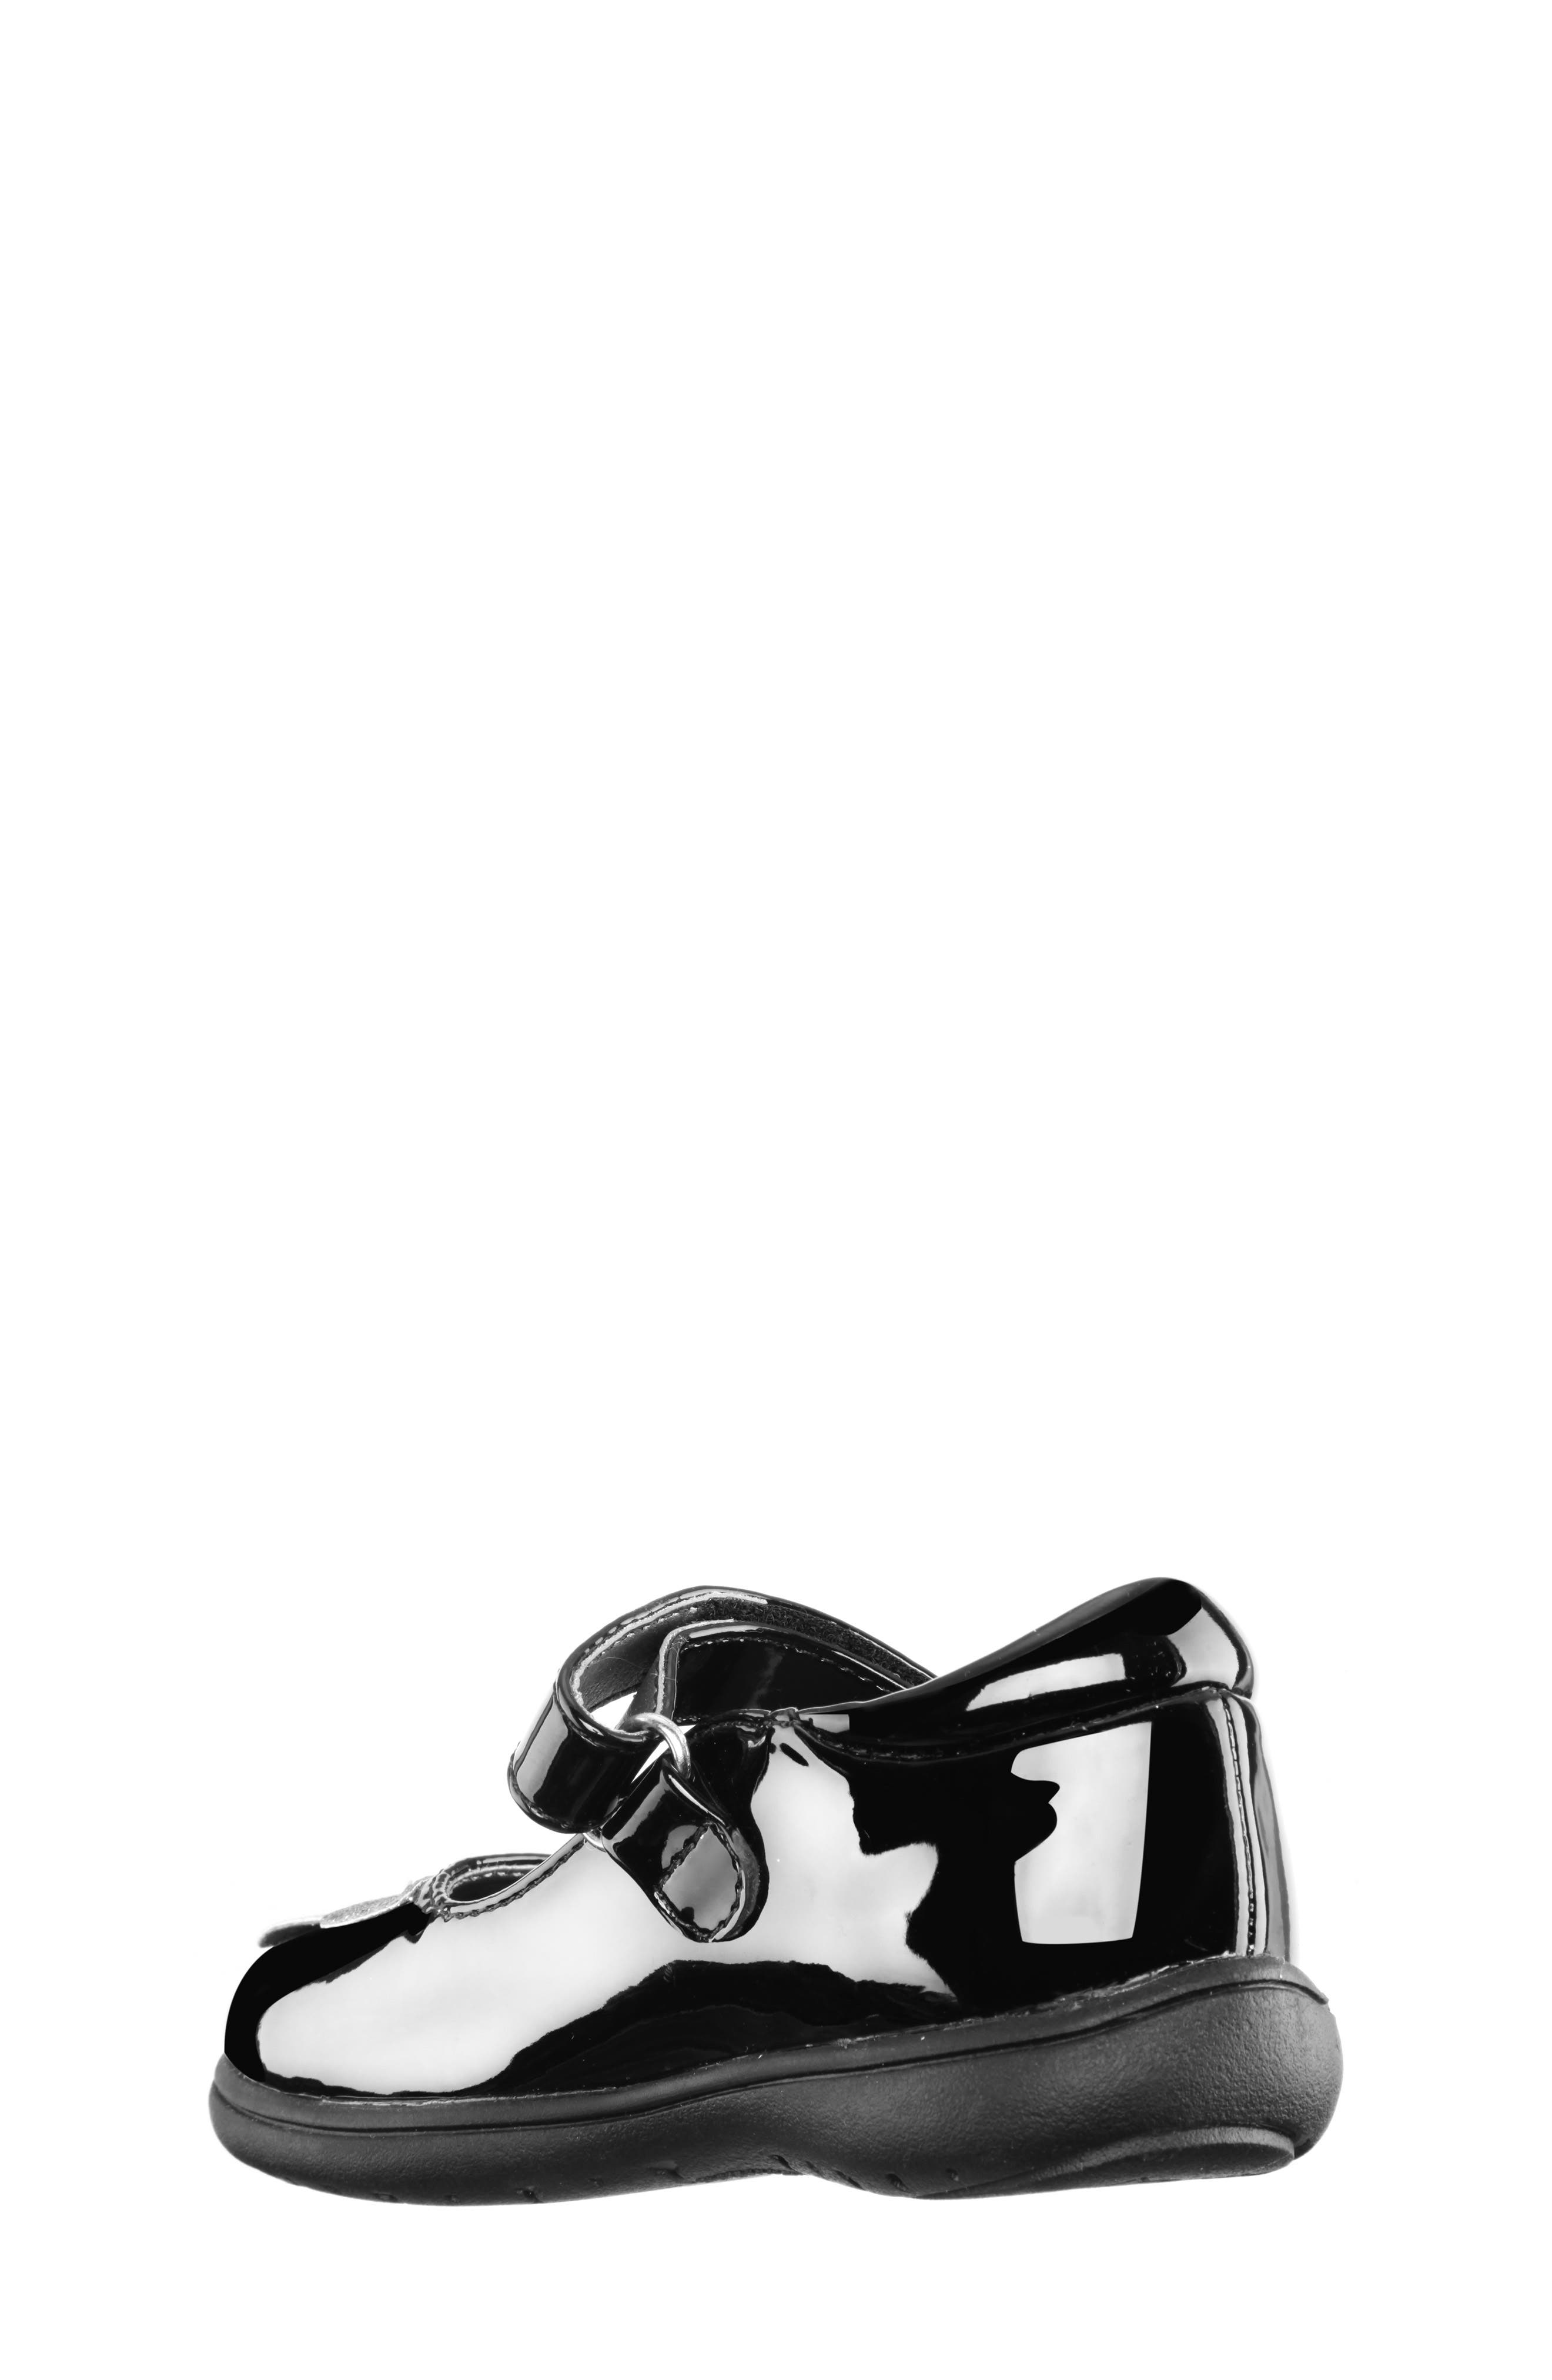 Alysha Glitter Mary Jane,                             Alternate thumbnail 2, color,                             BLACK/ PATENT GLITTER